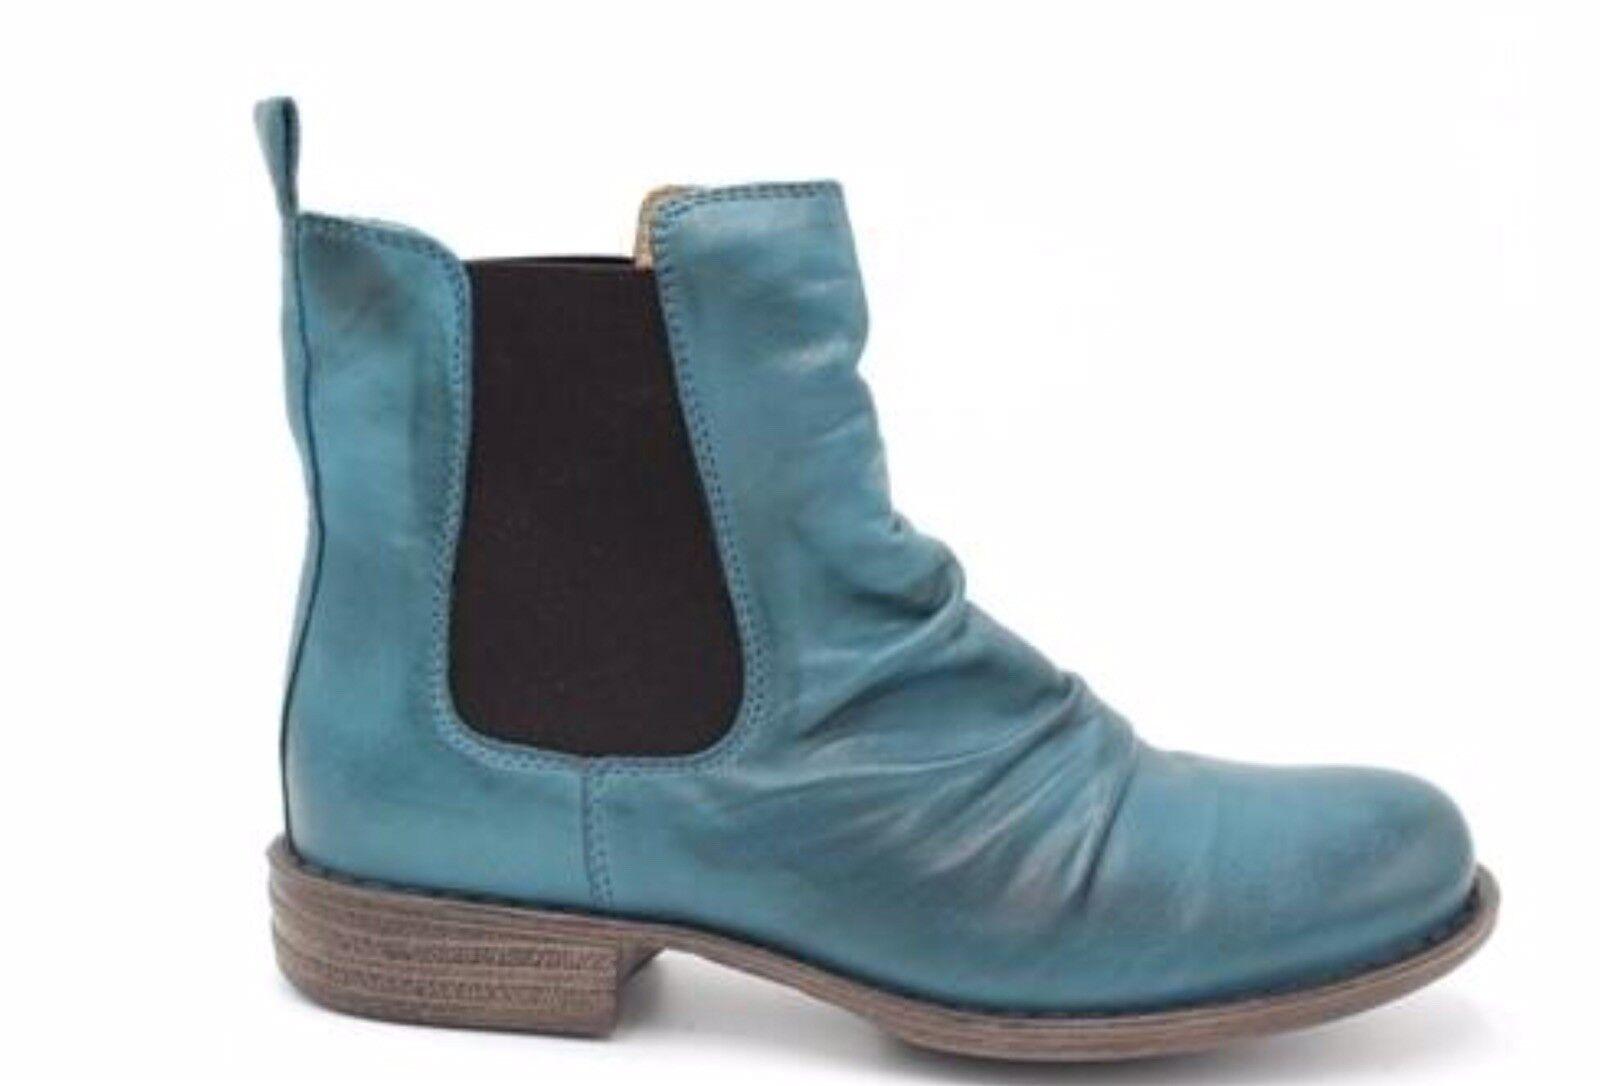 Miz Mooz Lissie, Chelsea Chelsea Chelsea Style Boots, Marine Light bluee Leather, Brand New, 6 f4c5ae